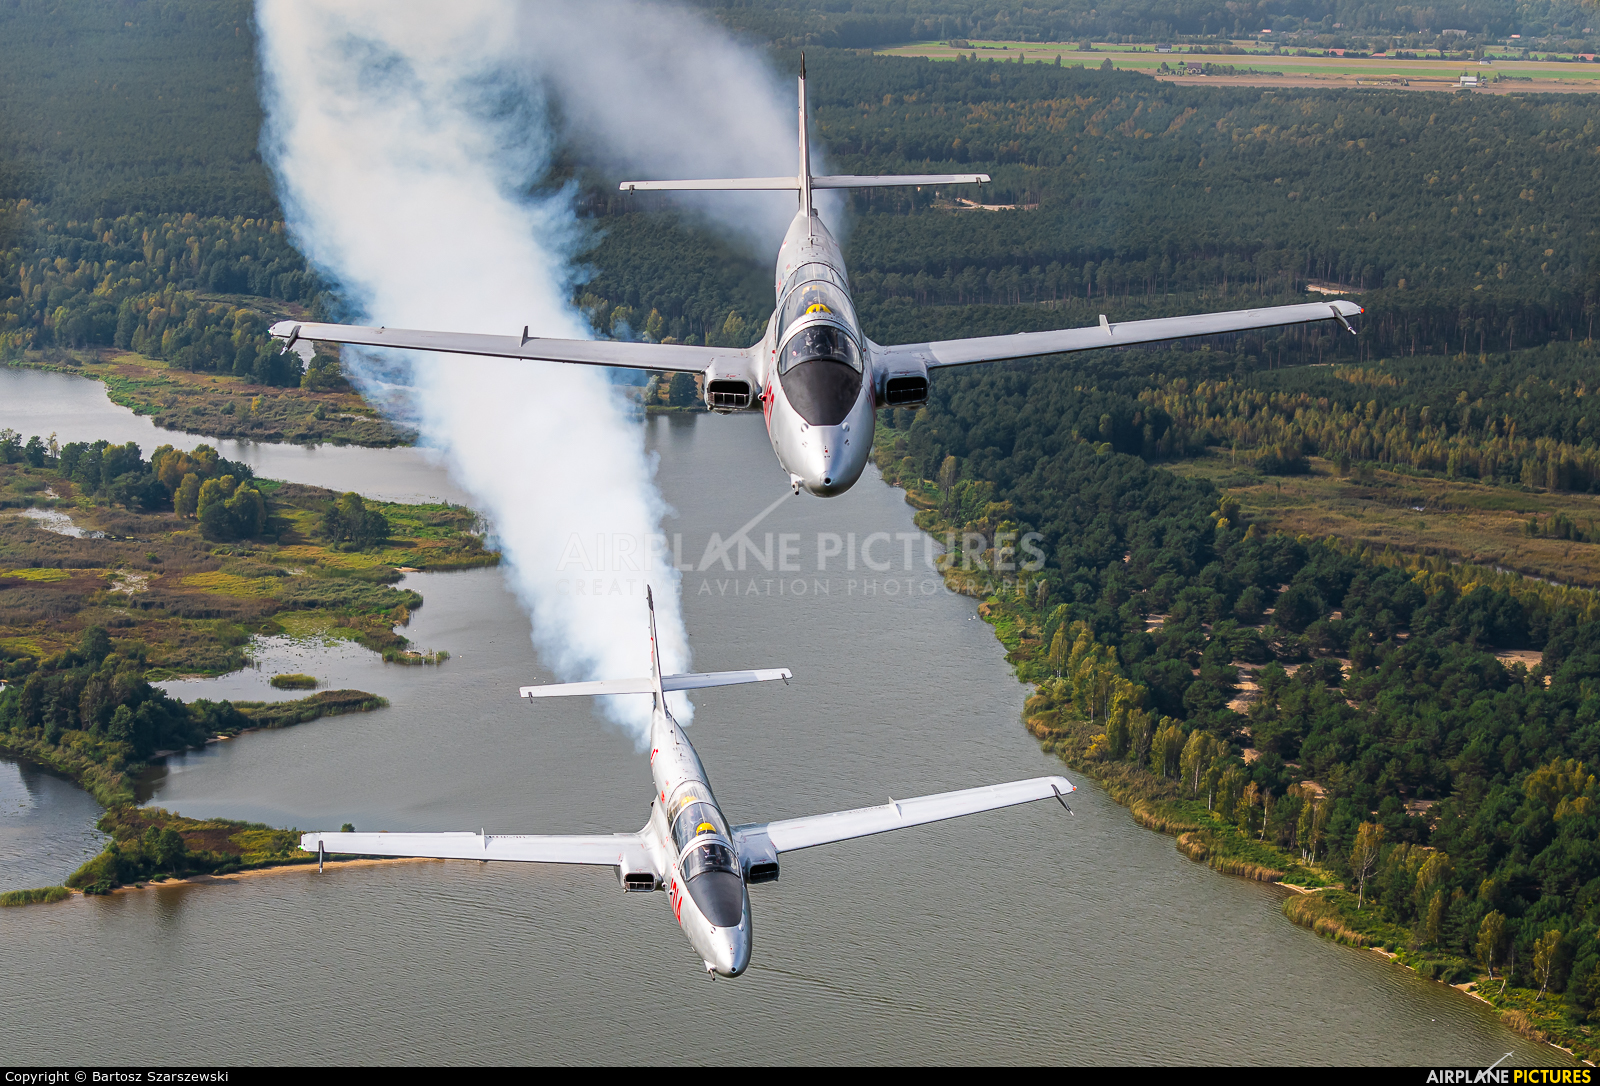 Poland - Air Force 1402 aircraft at Piotrków Trybunalski